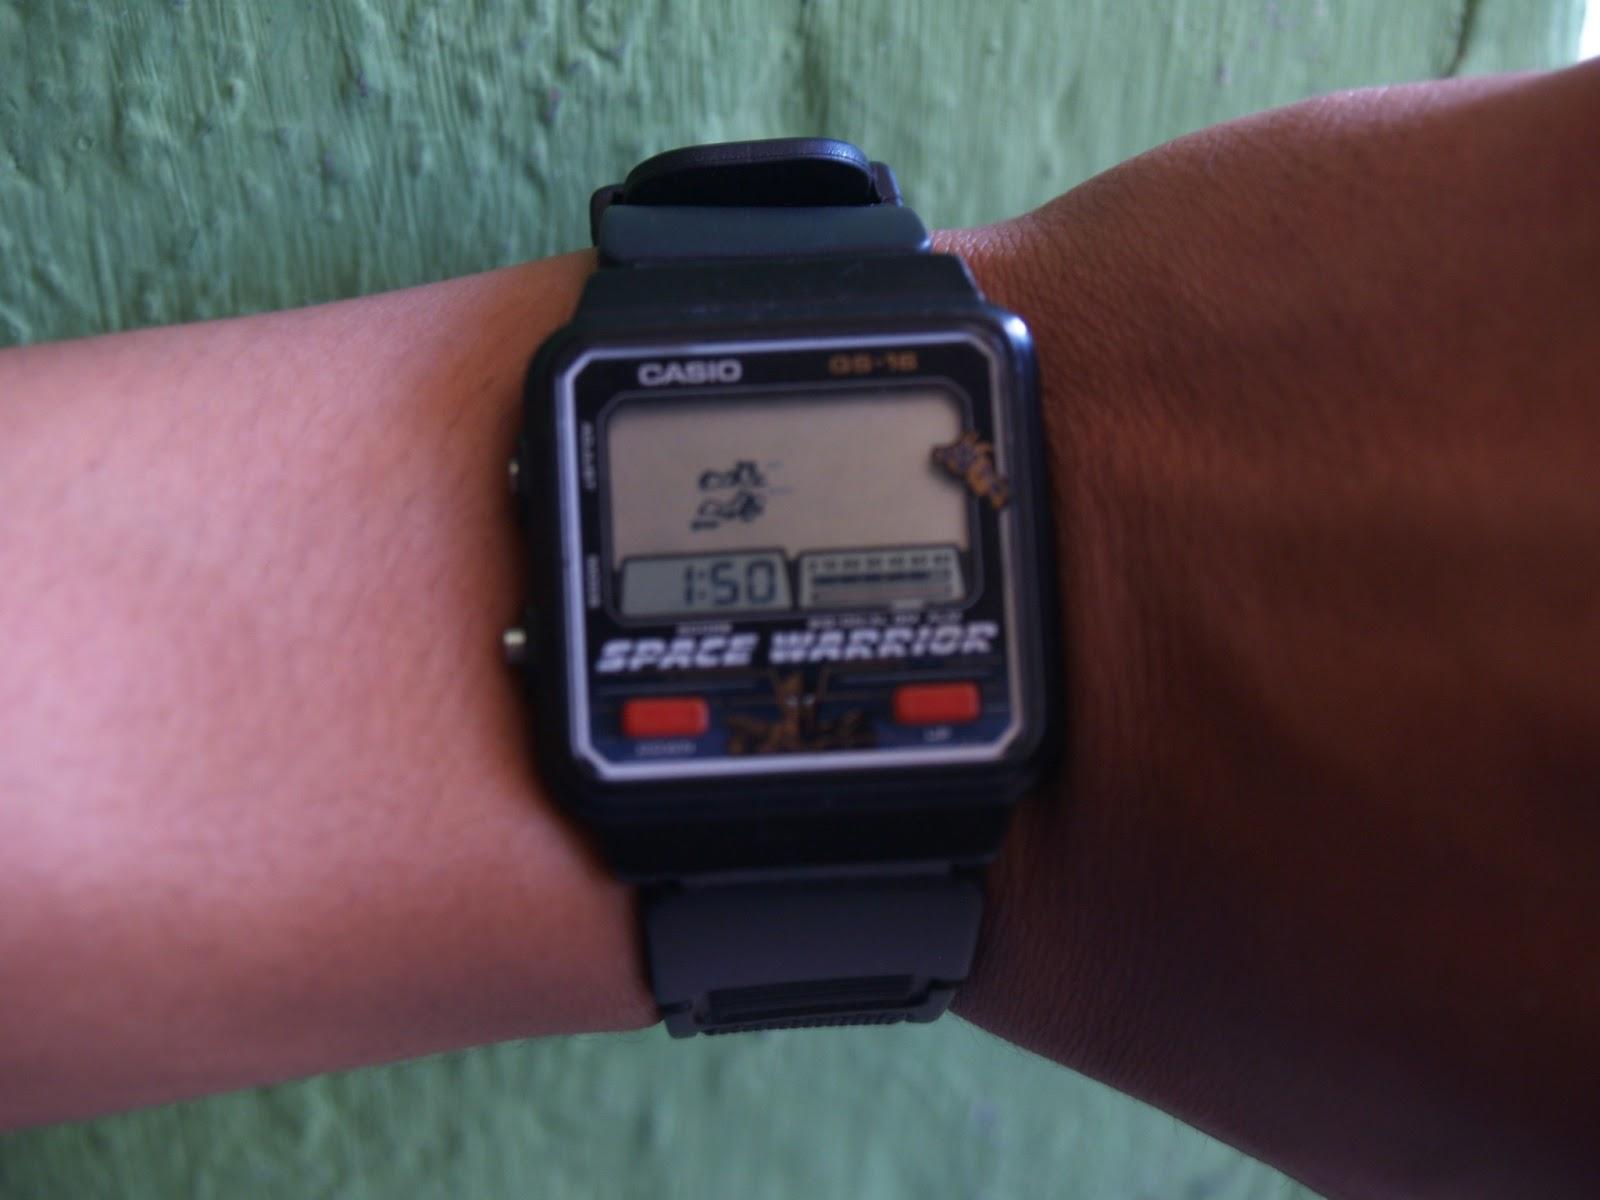 Jam Tangan Casio Gimbot Space Warrior Cocooan Jadul 758ec7f6d7